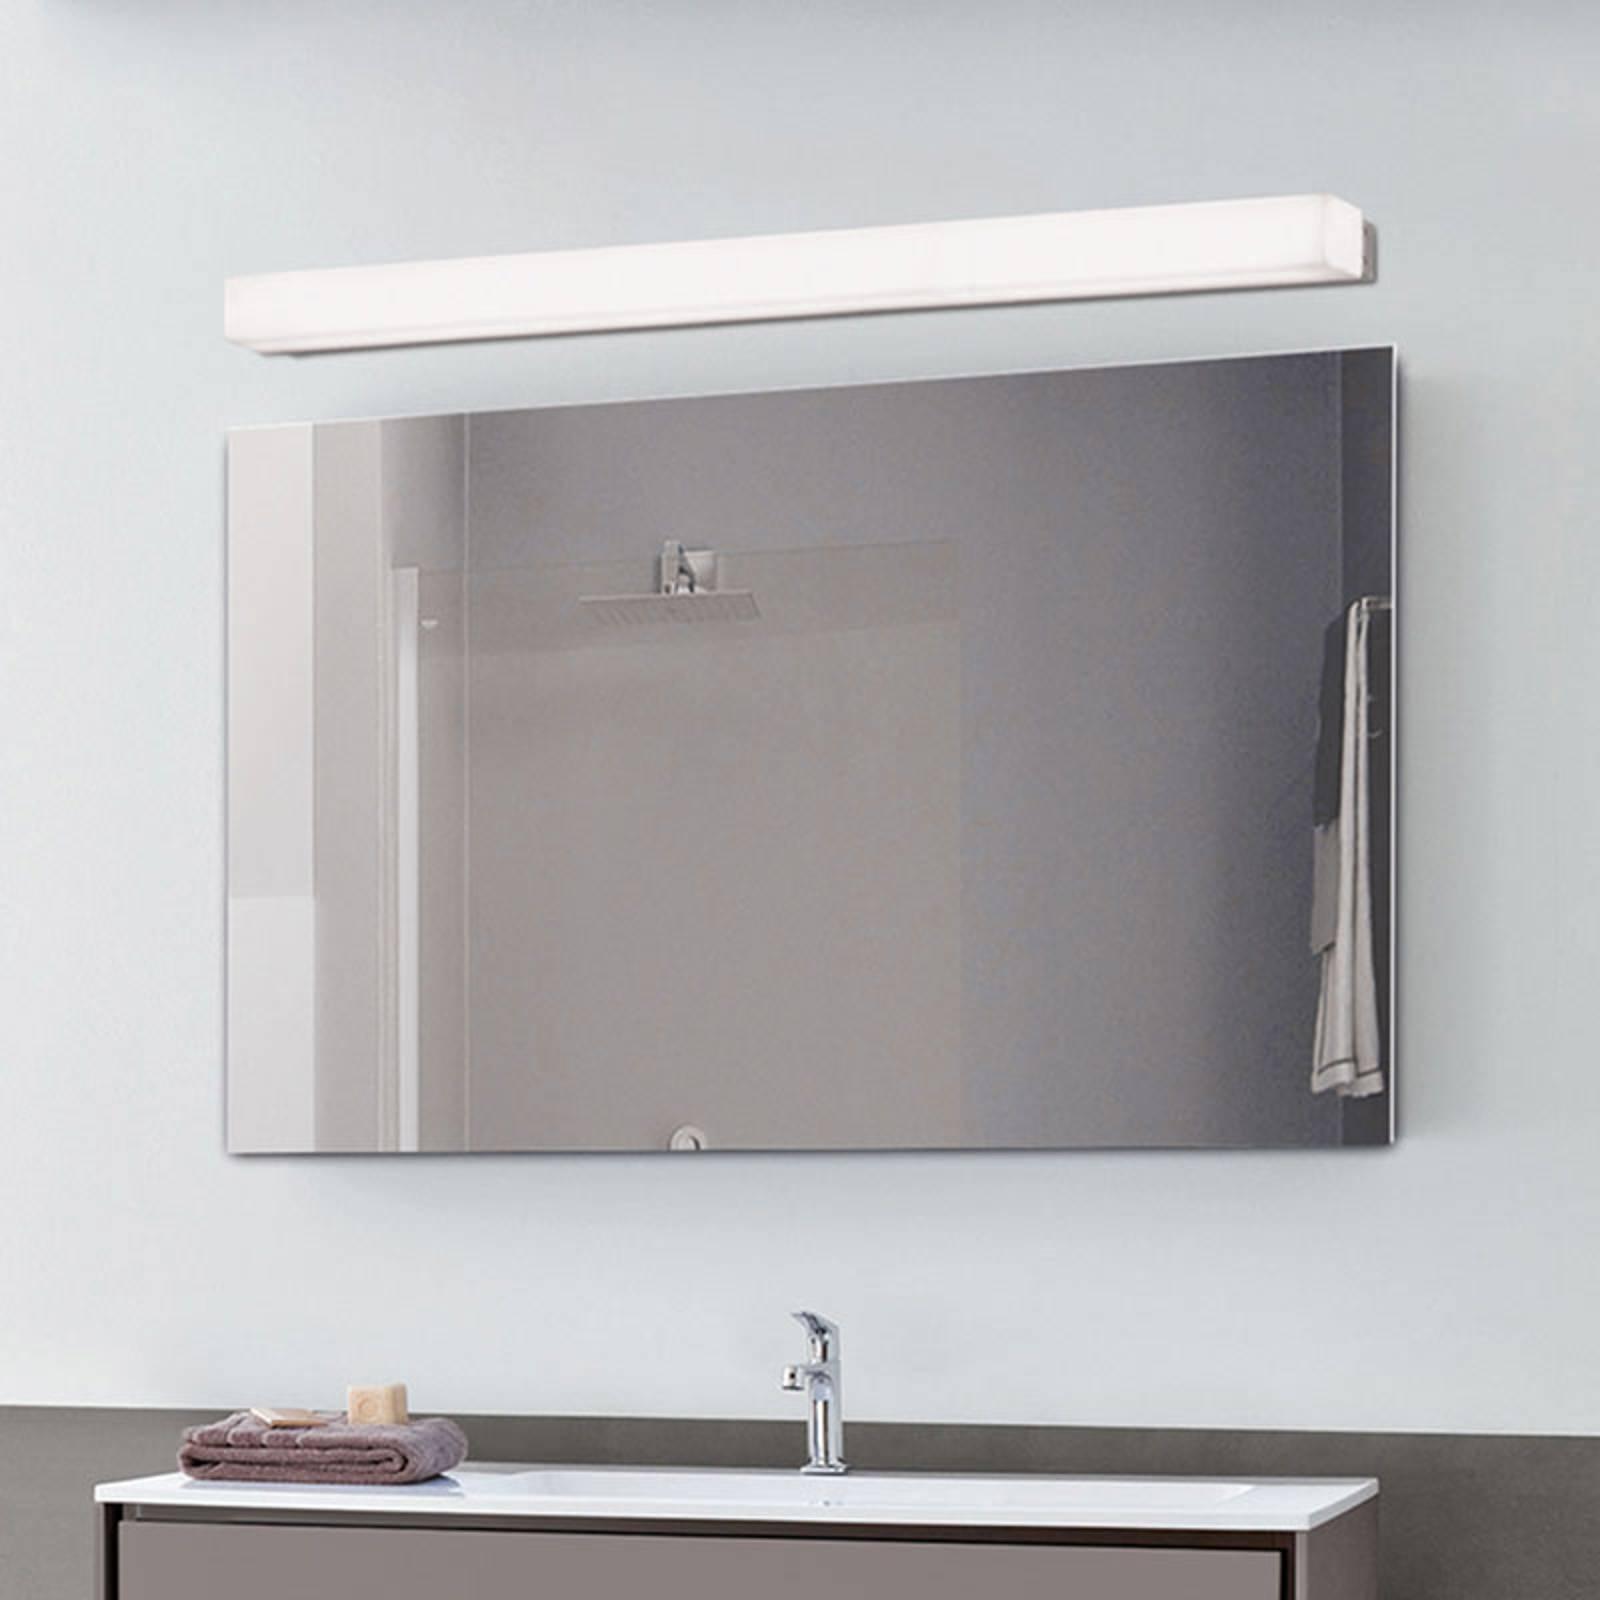 LED-Bad-Wandleuchte Box, 3.000 K, Breite 89 cm